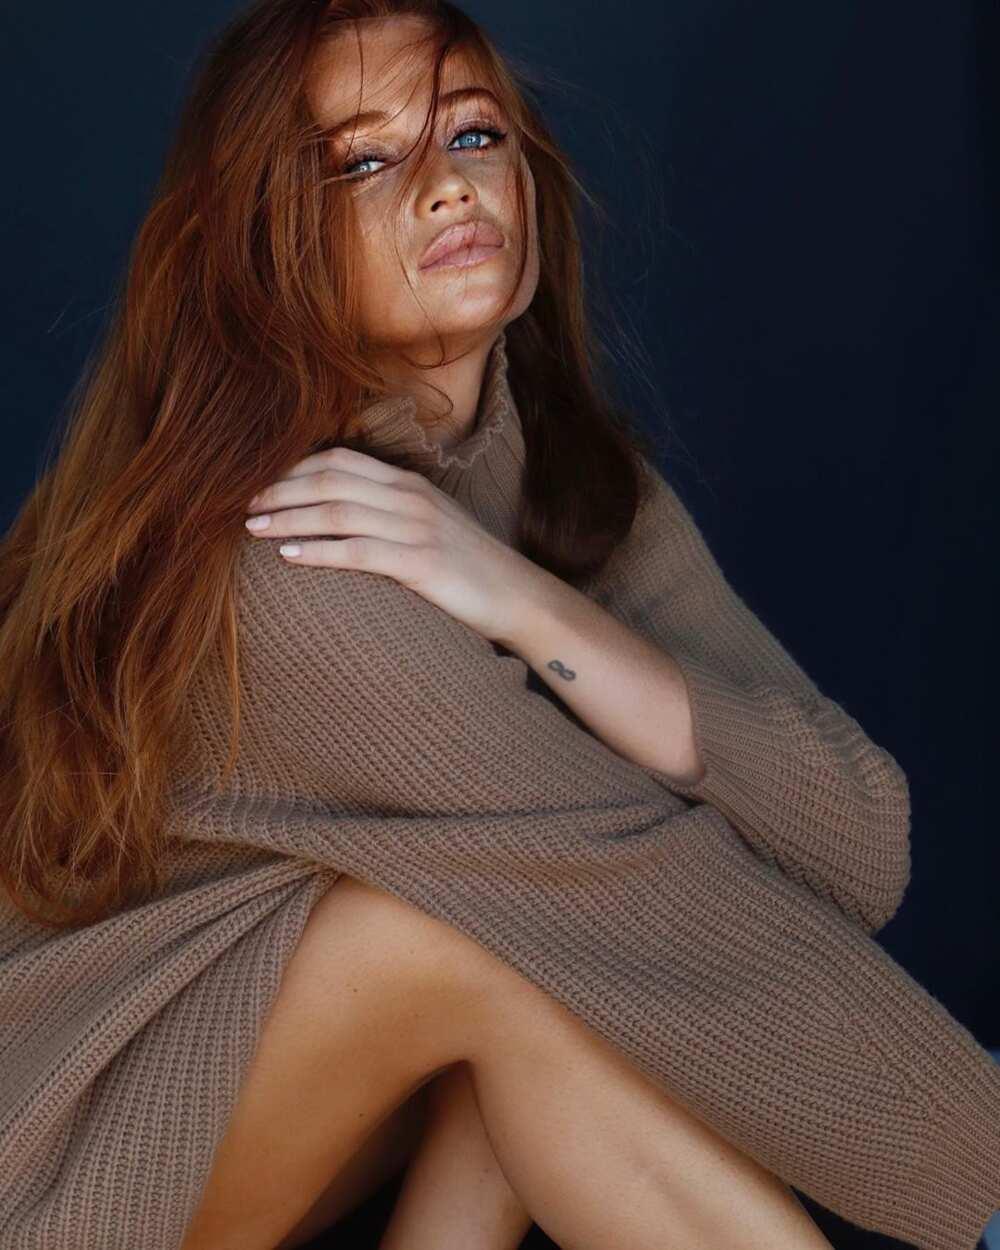 redhead actresses